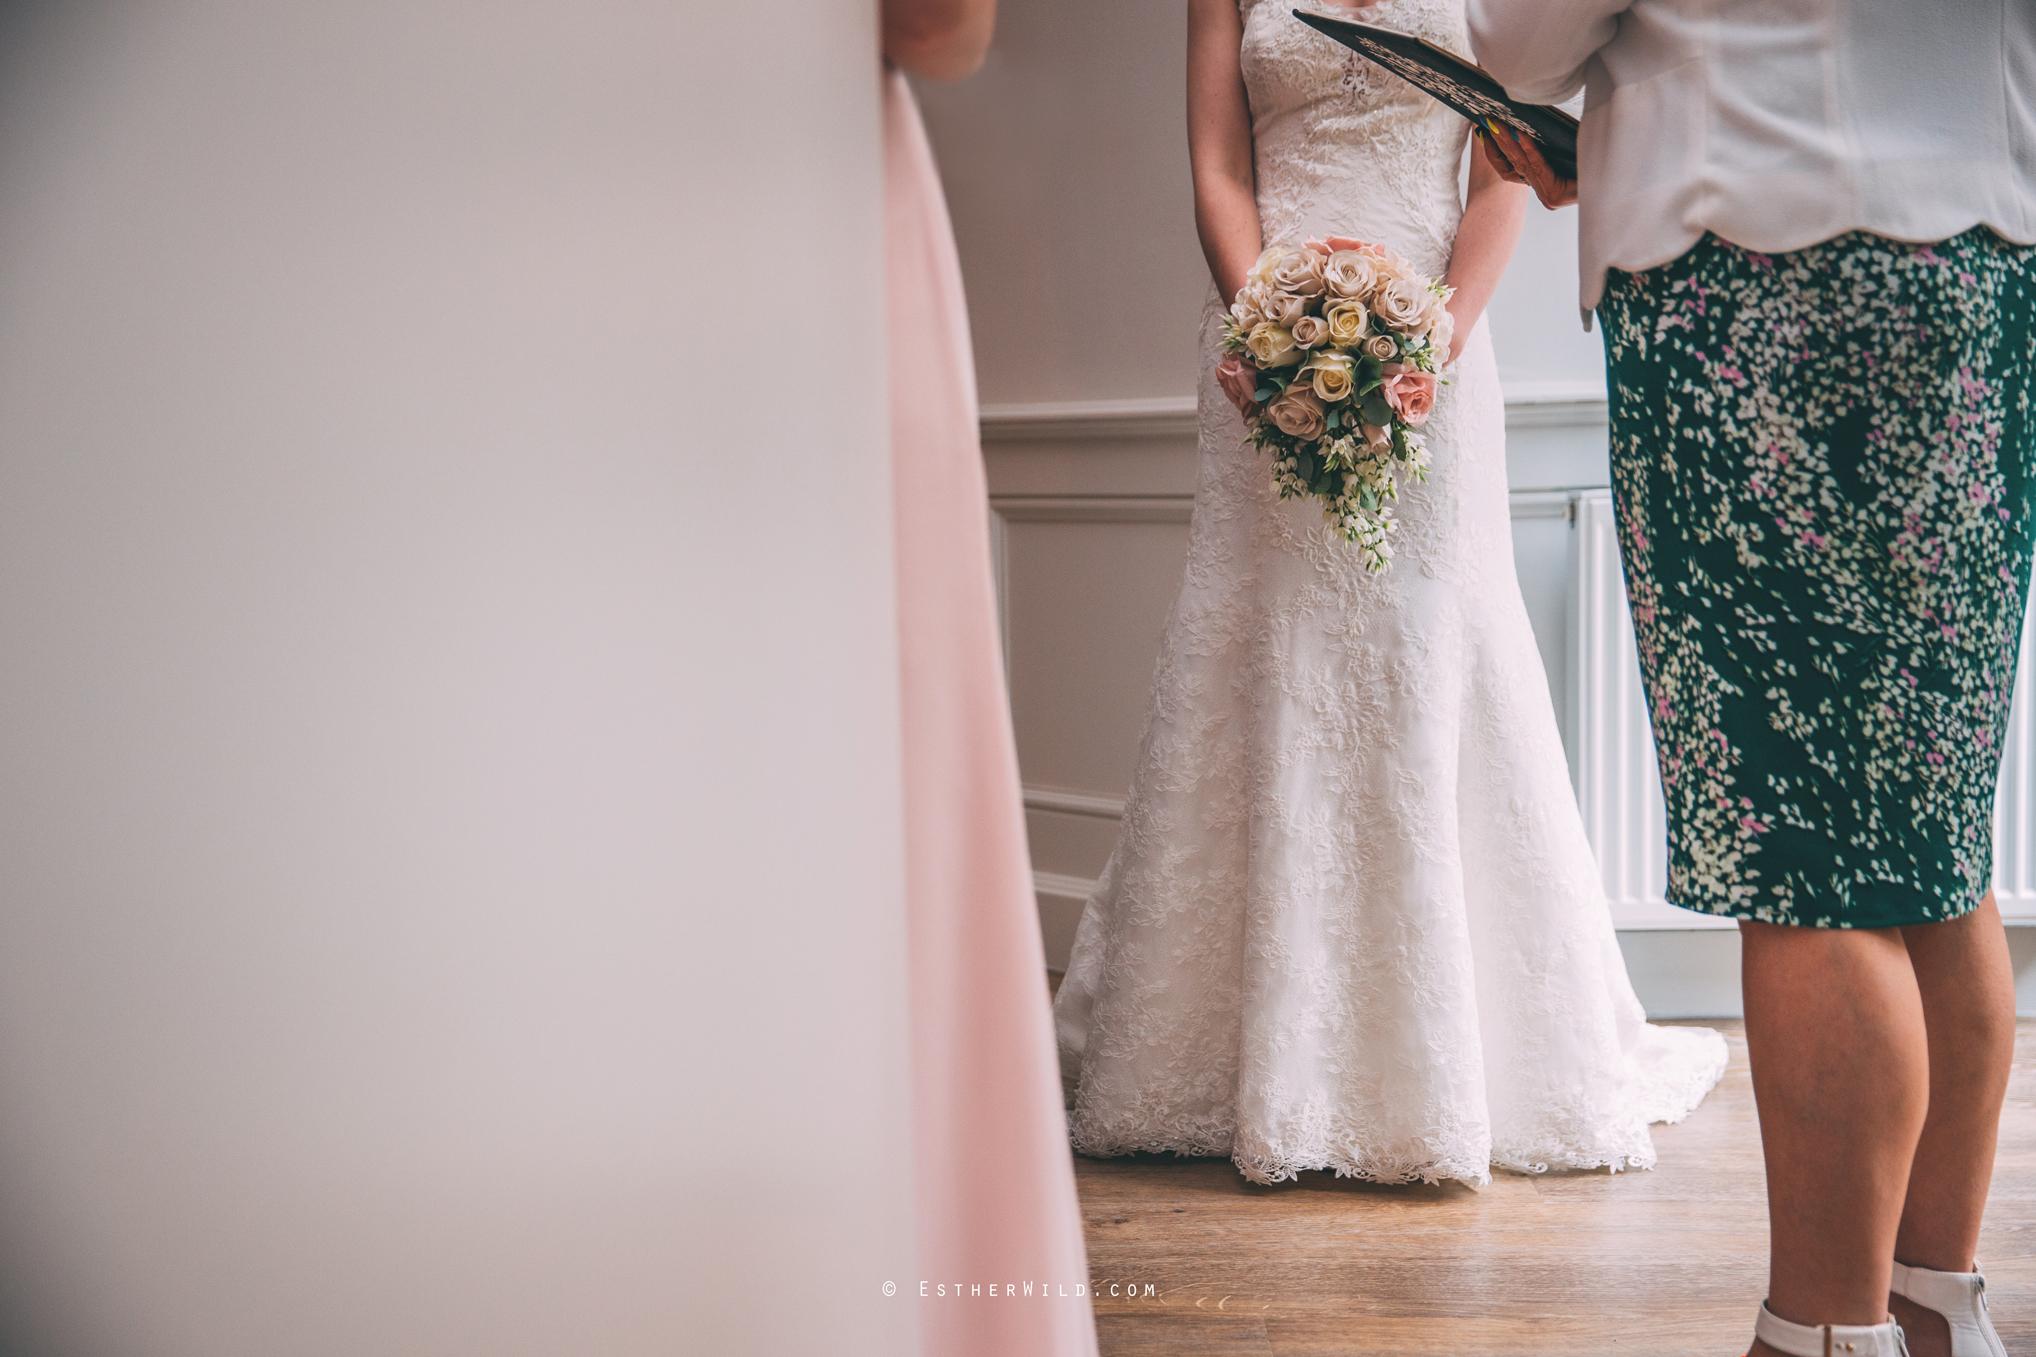 0817_Holiday_Inn_Norwich_Wedding_Photography_Esther_Wild_IMG_0300.jpg